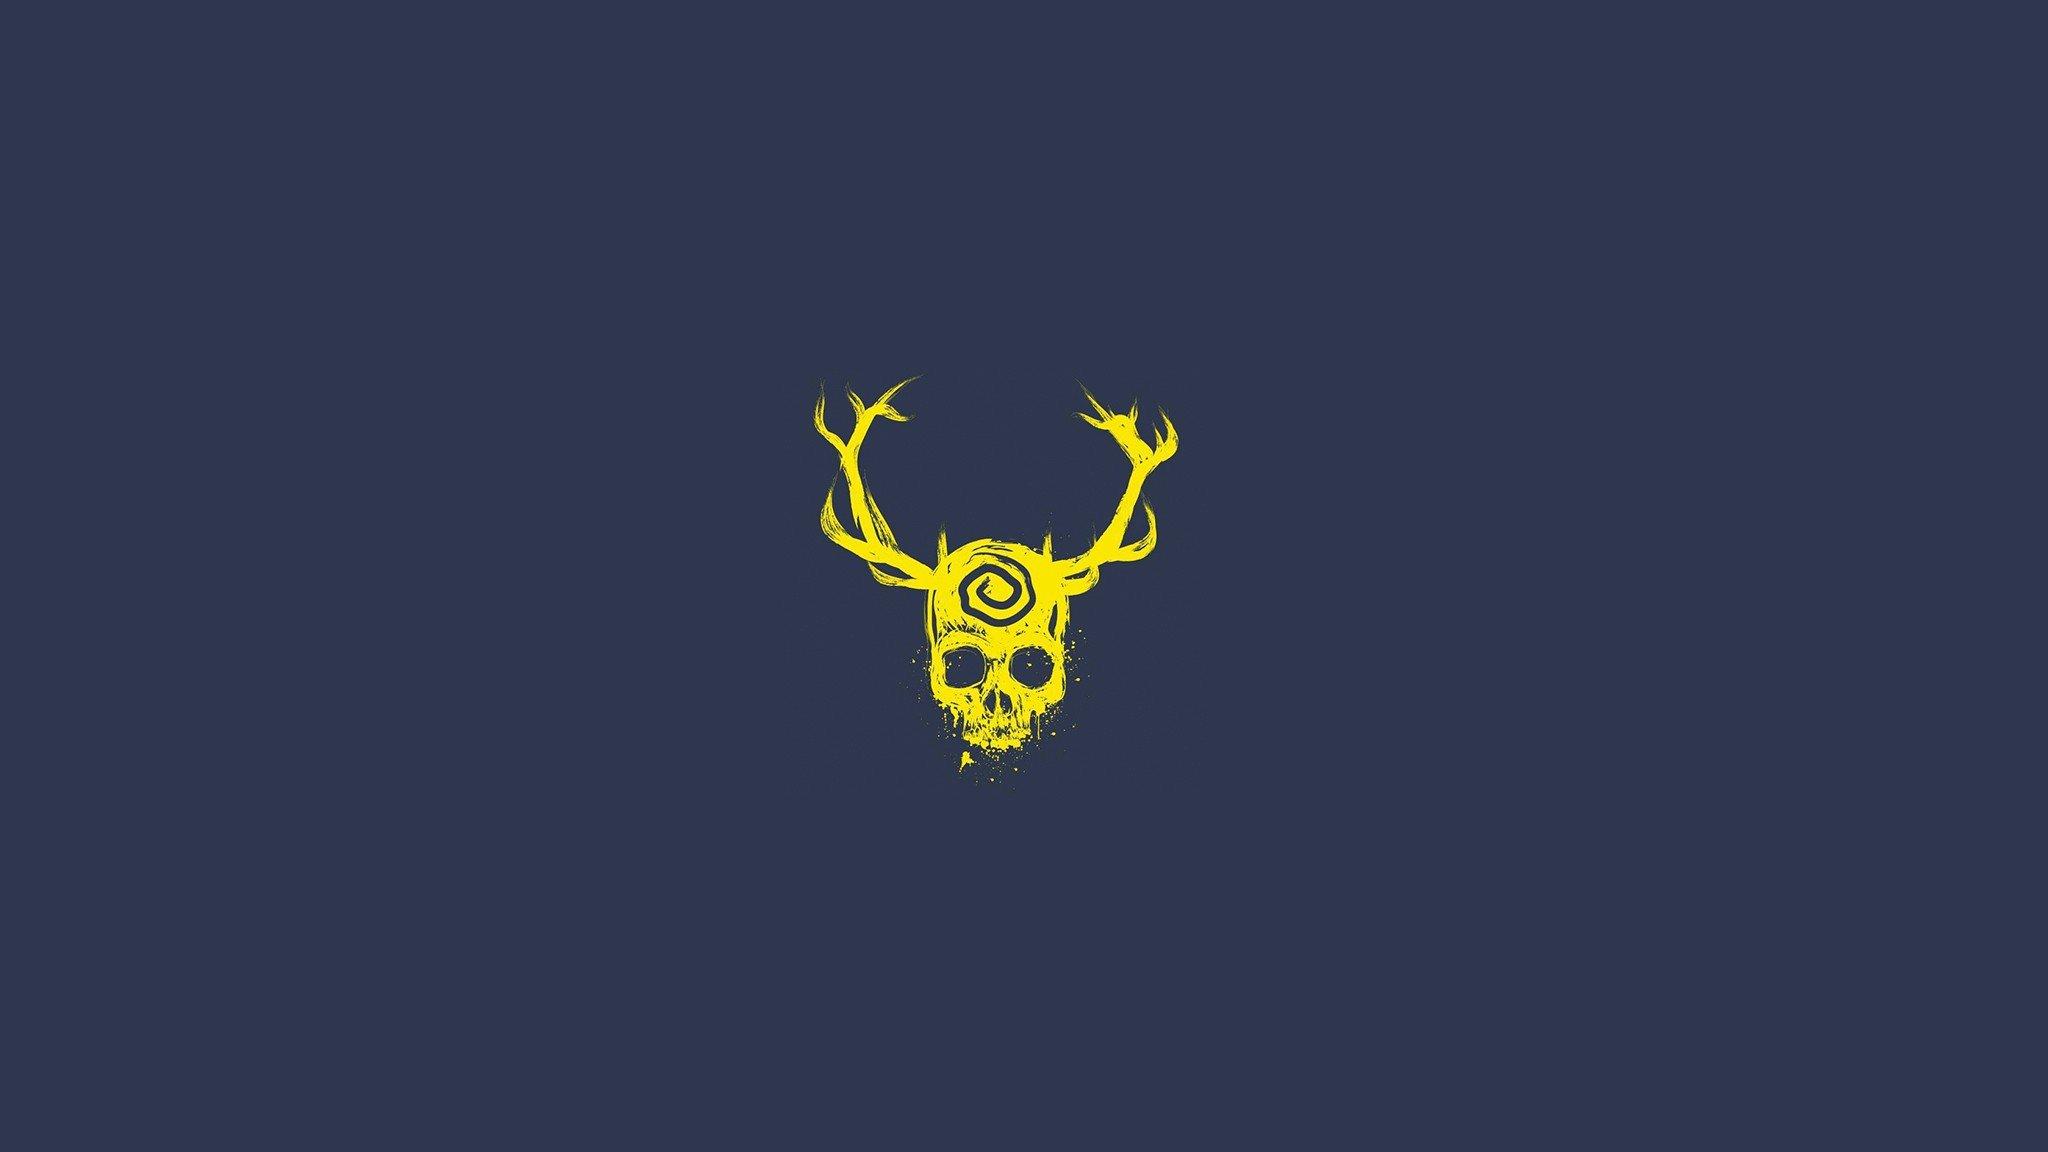 True Detective Wallpaper Iphone Skull Yellow Dark Blue True Detective Wallpapers Hd